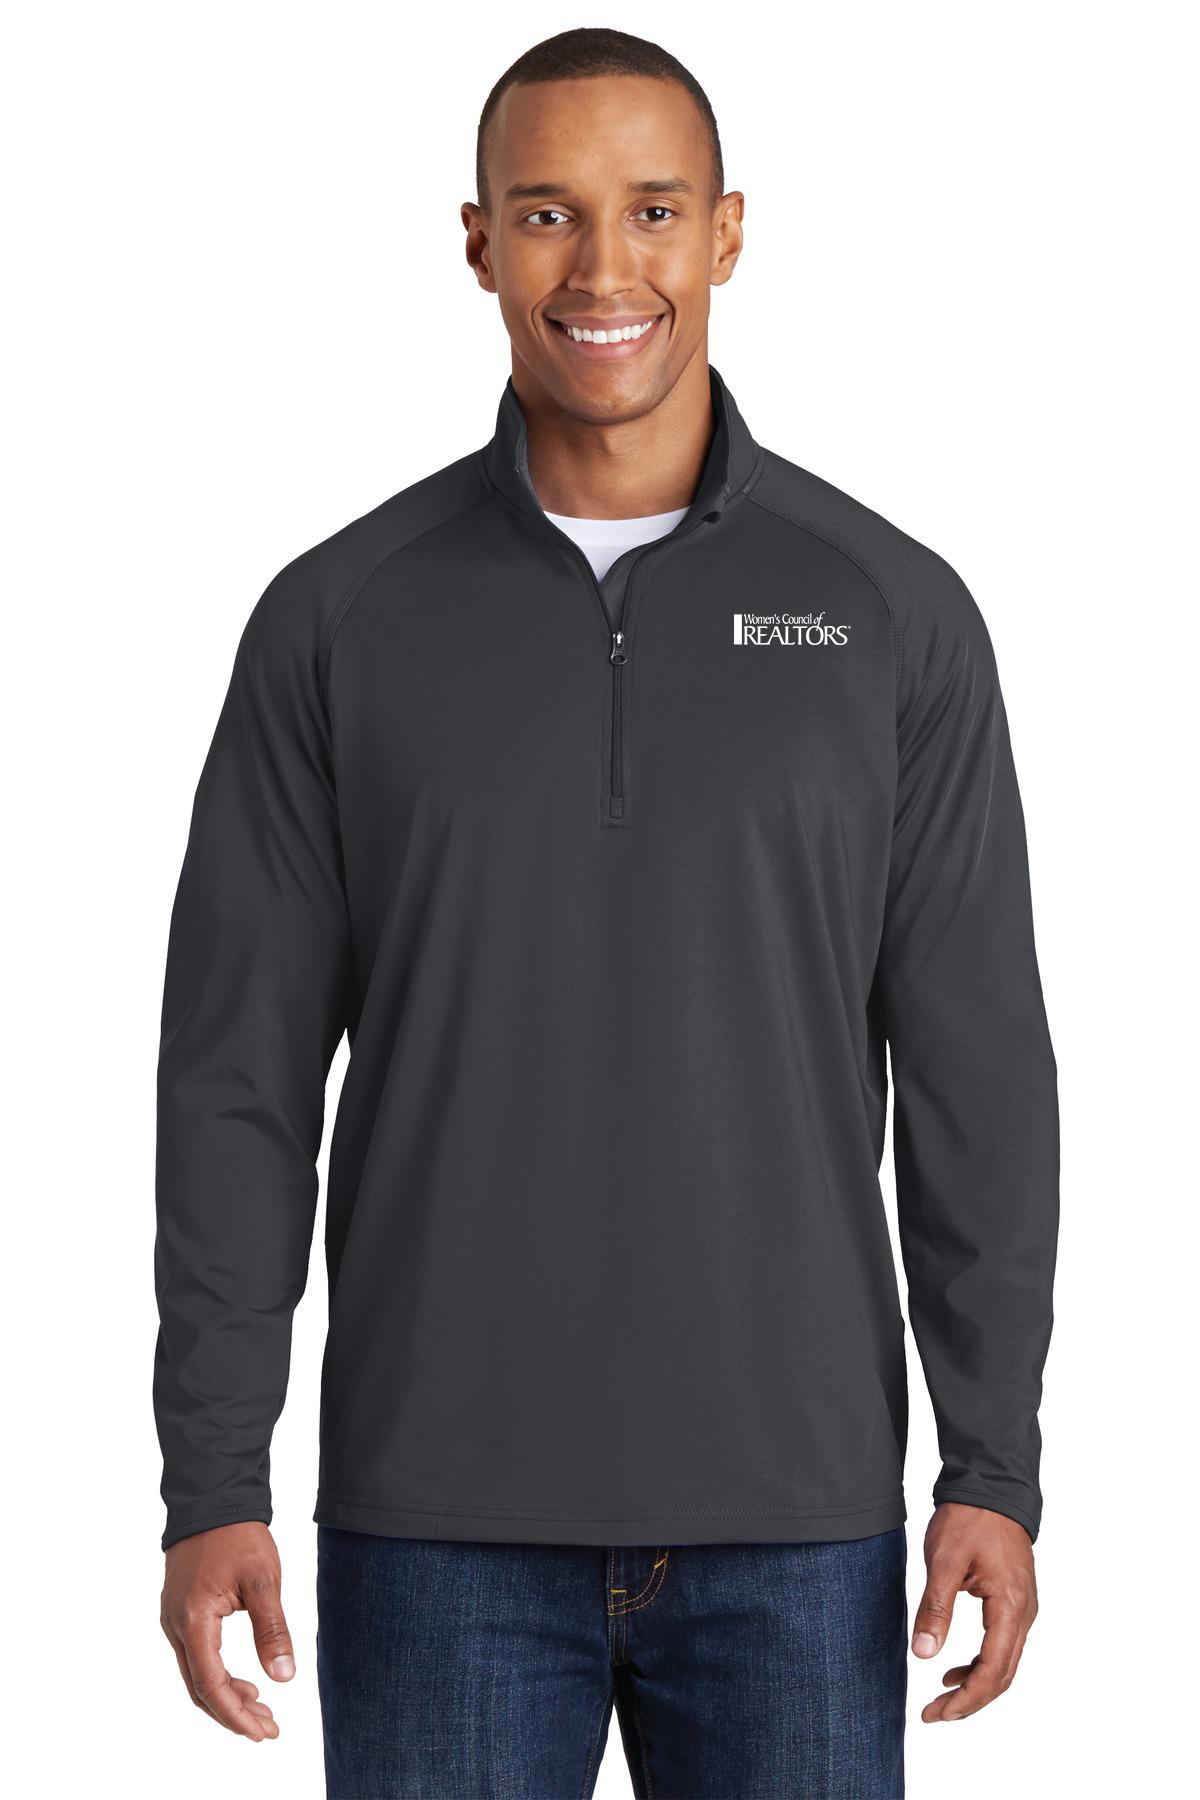 Mens Sport Stretch 1/2 Zip Pullover Pullover,Fleece,Long Sleeve